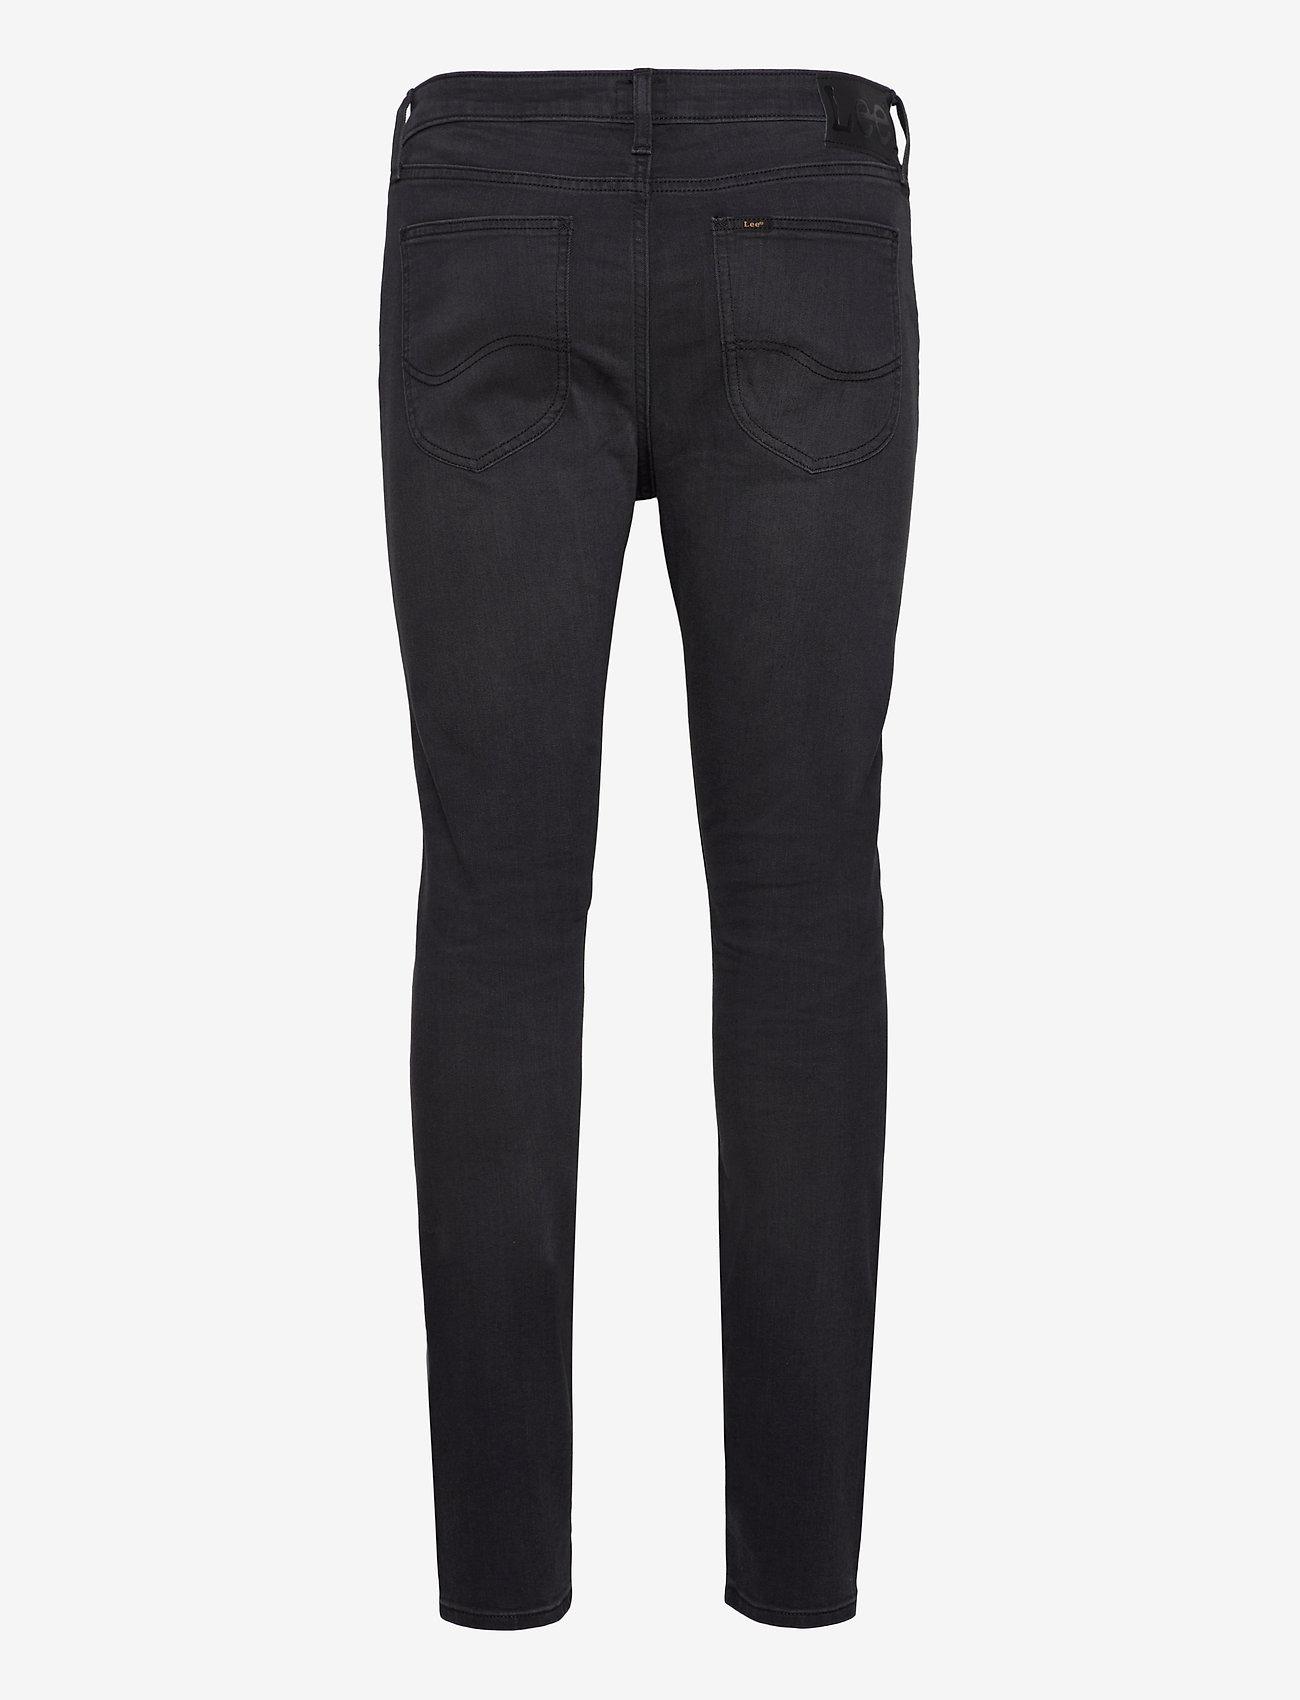 Lee Jeans - MALONE - skinny jeans - dark eden - 1